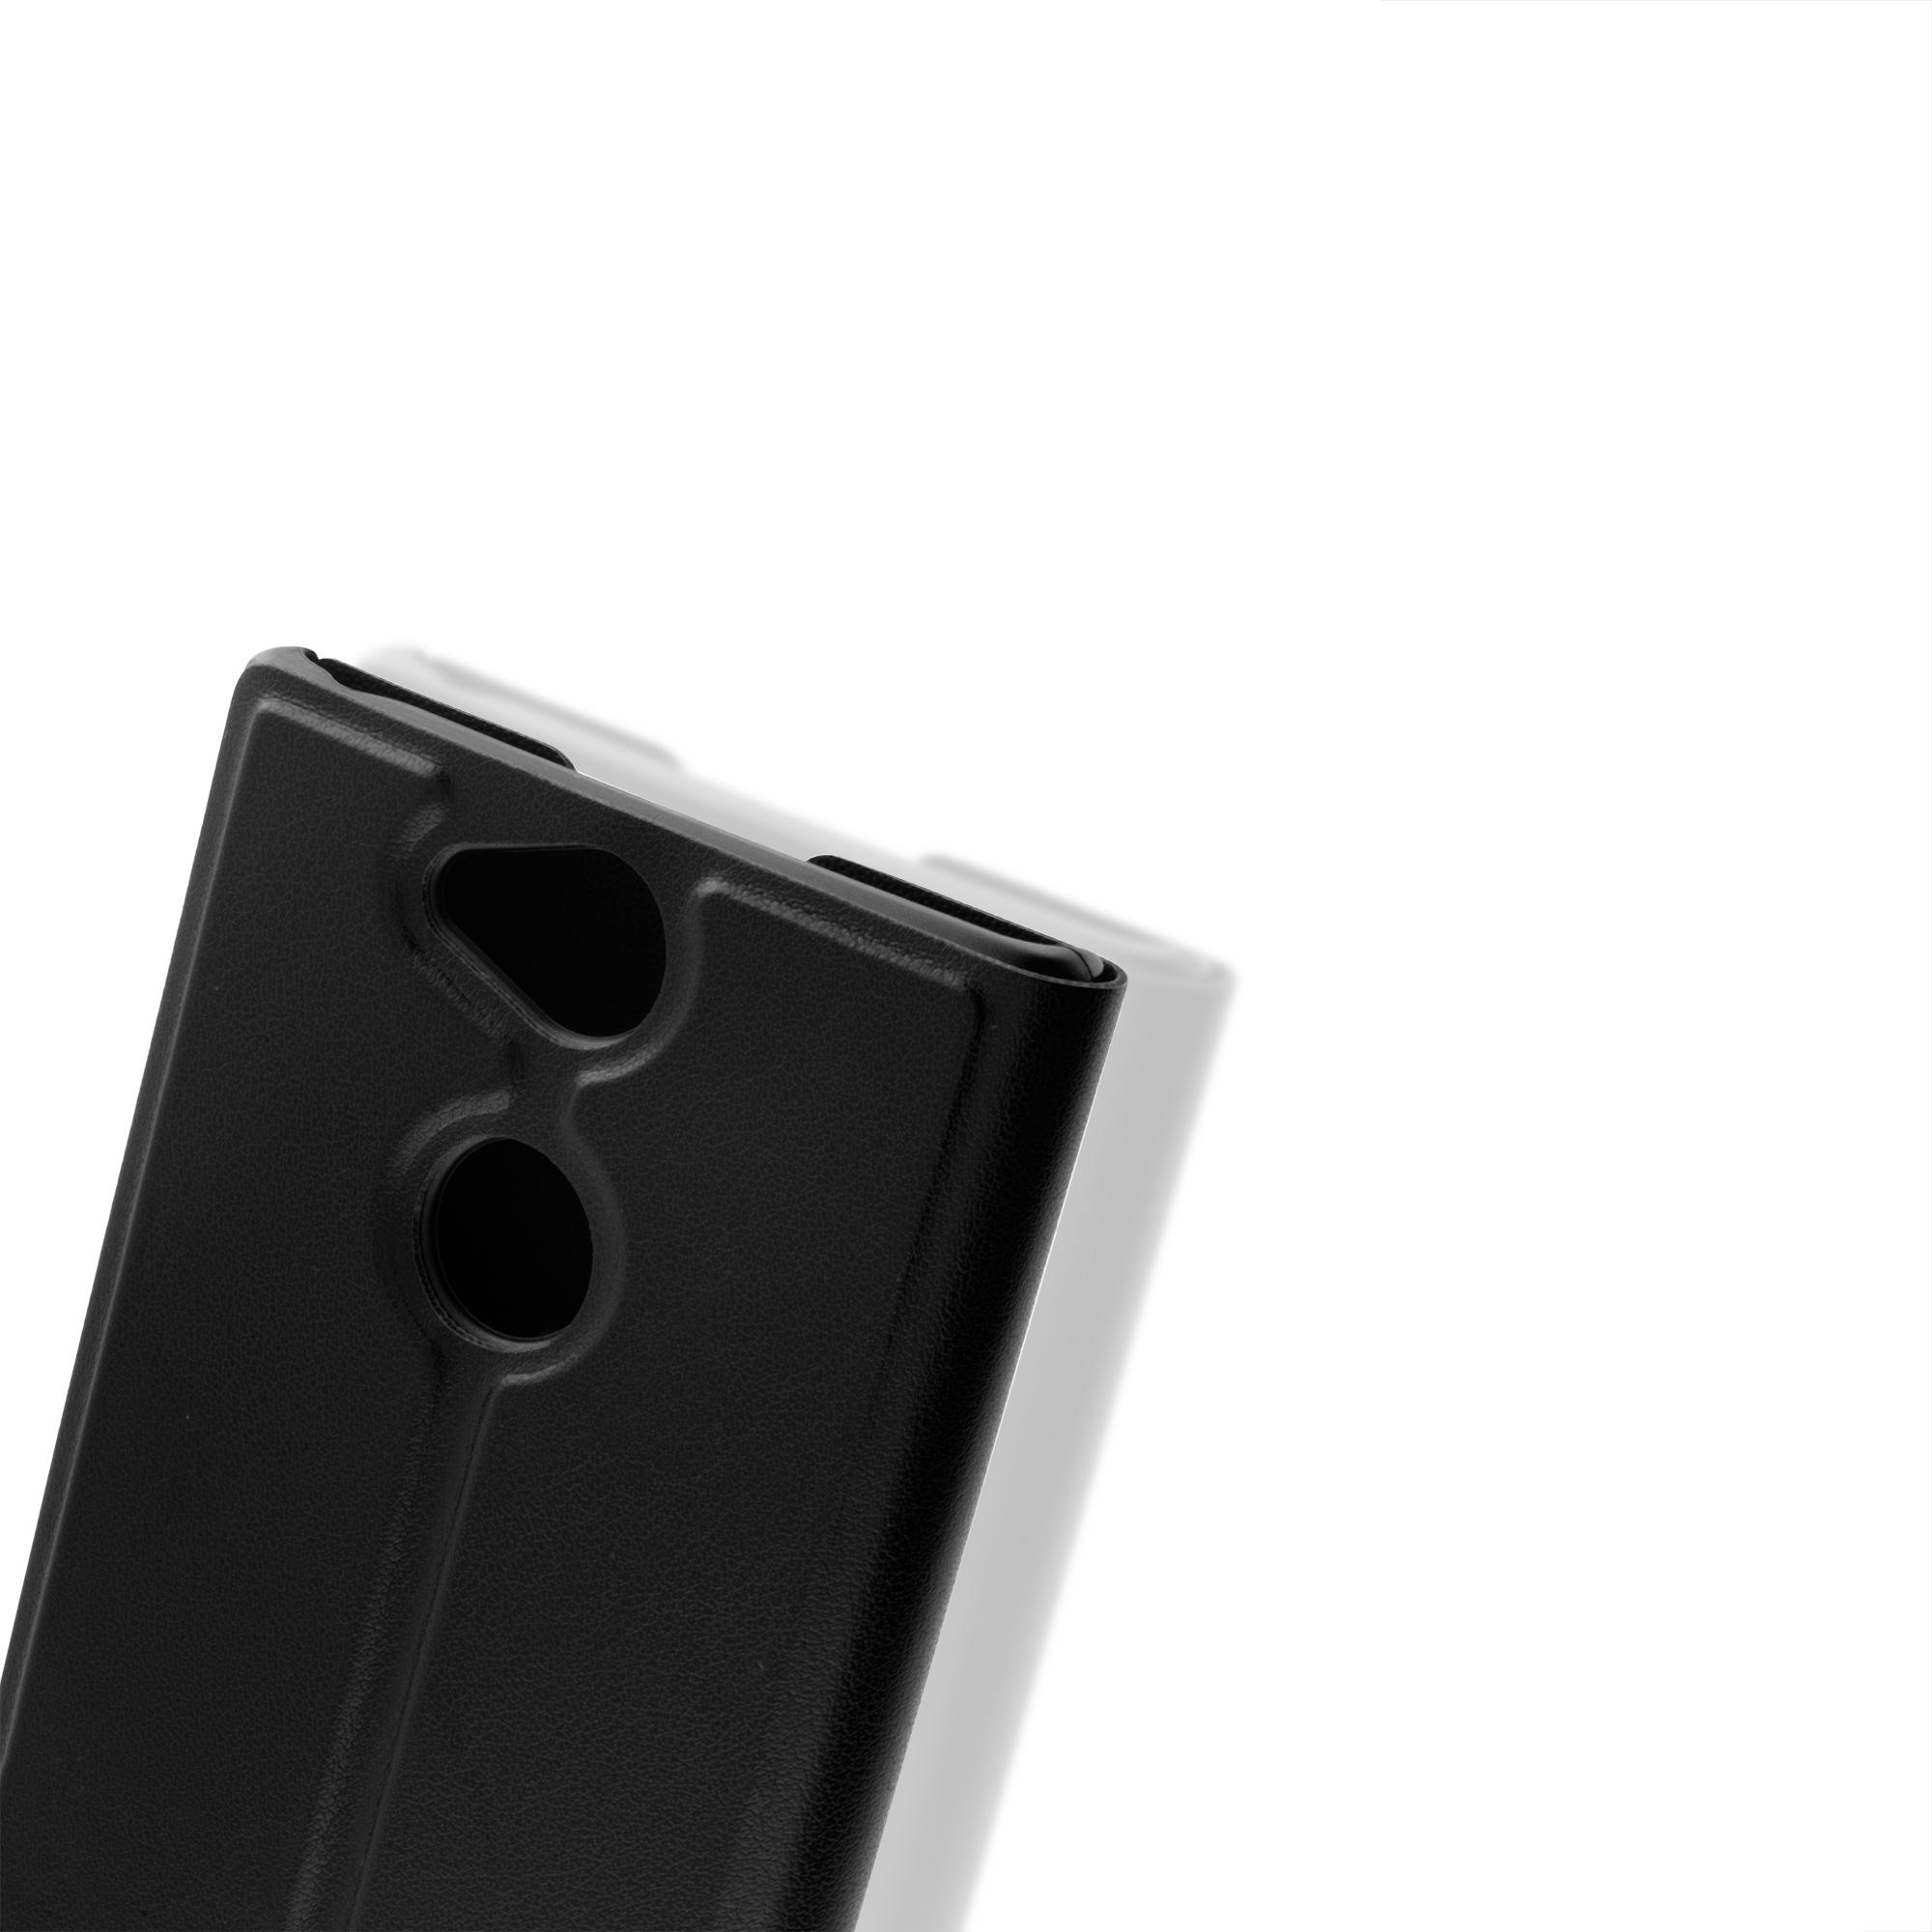 Чехол-книжка для Xperia XA2 чёрного цвета в Sony Centre Воронеж